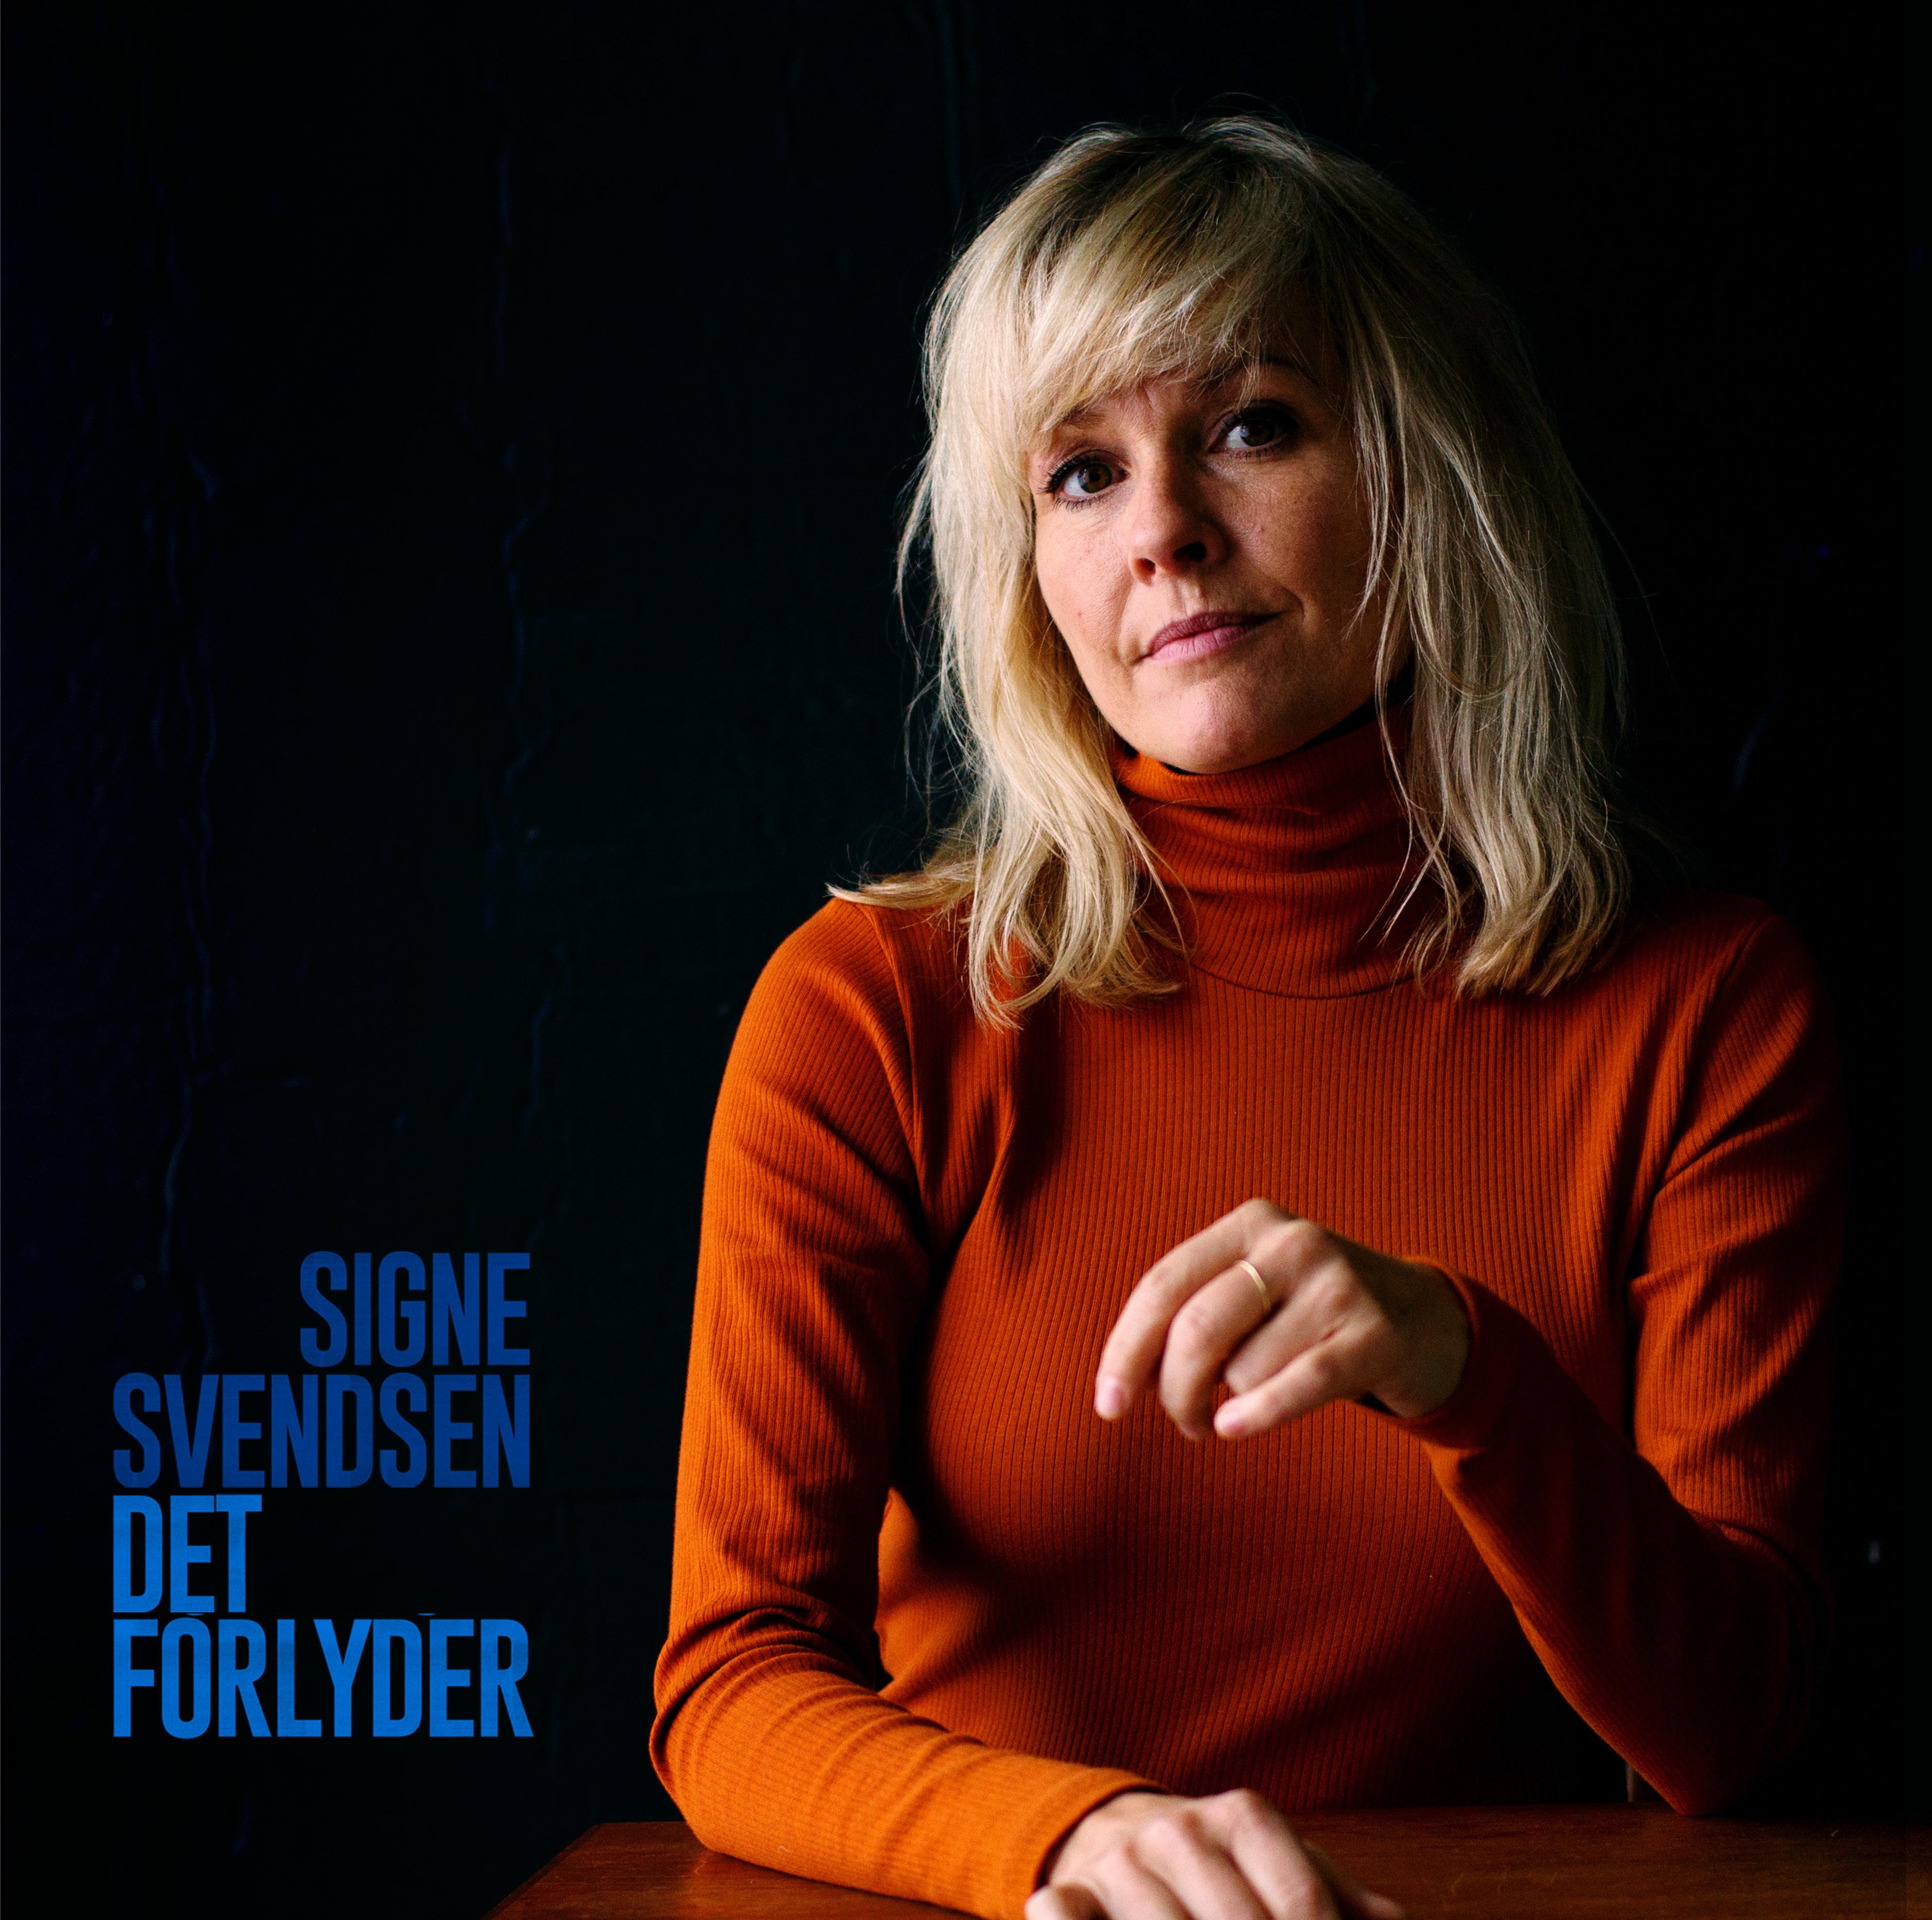 Det Forlyder - Signe Svendsen - Musik - I Do Records - 5707785011324 - 31. januar 2020